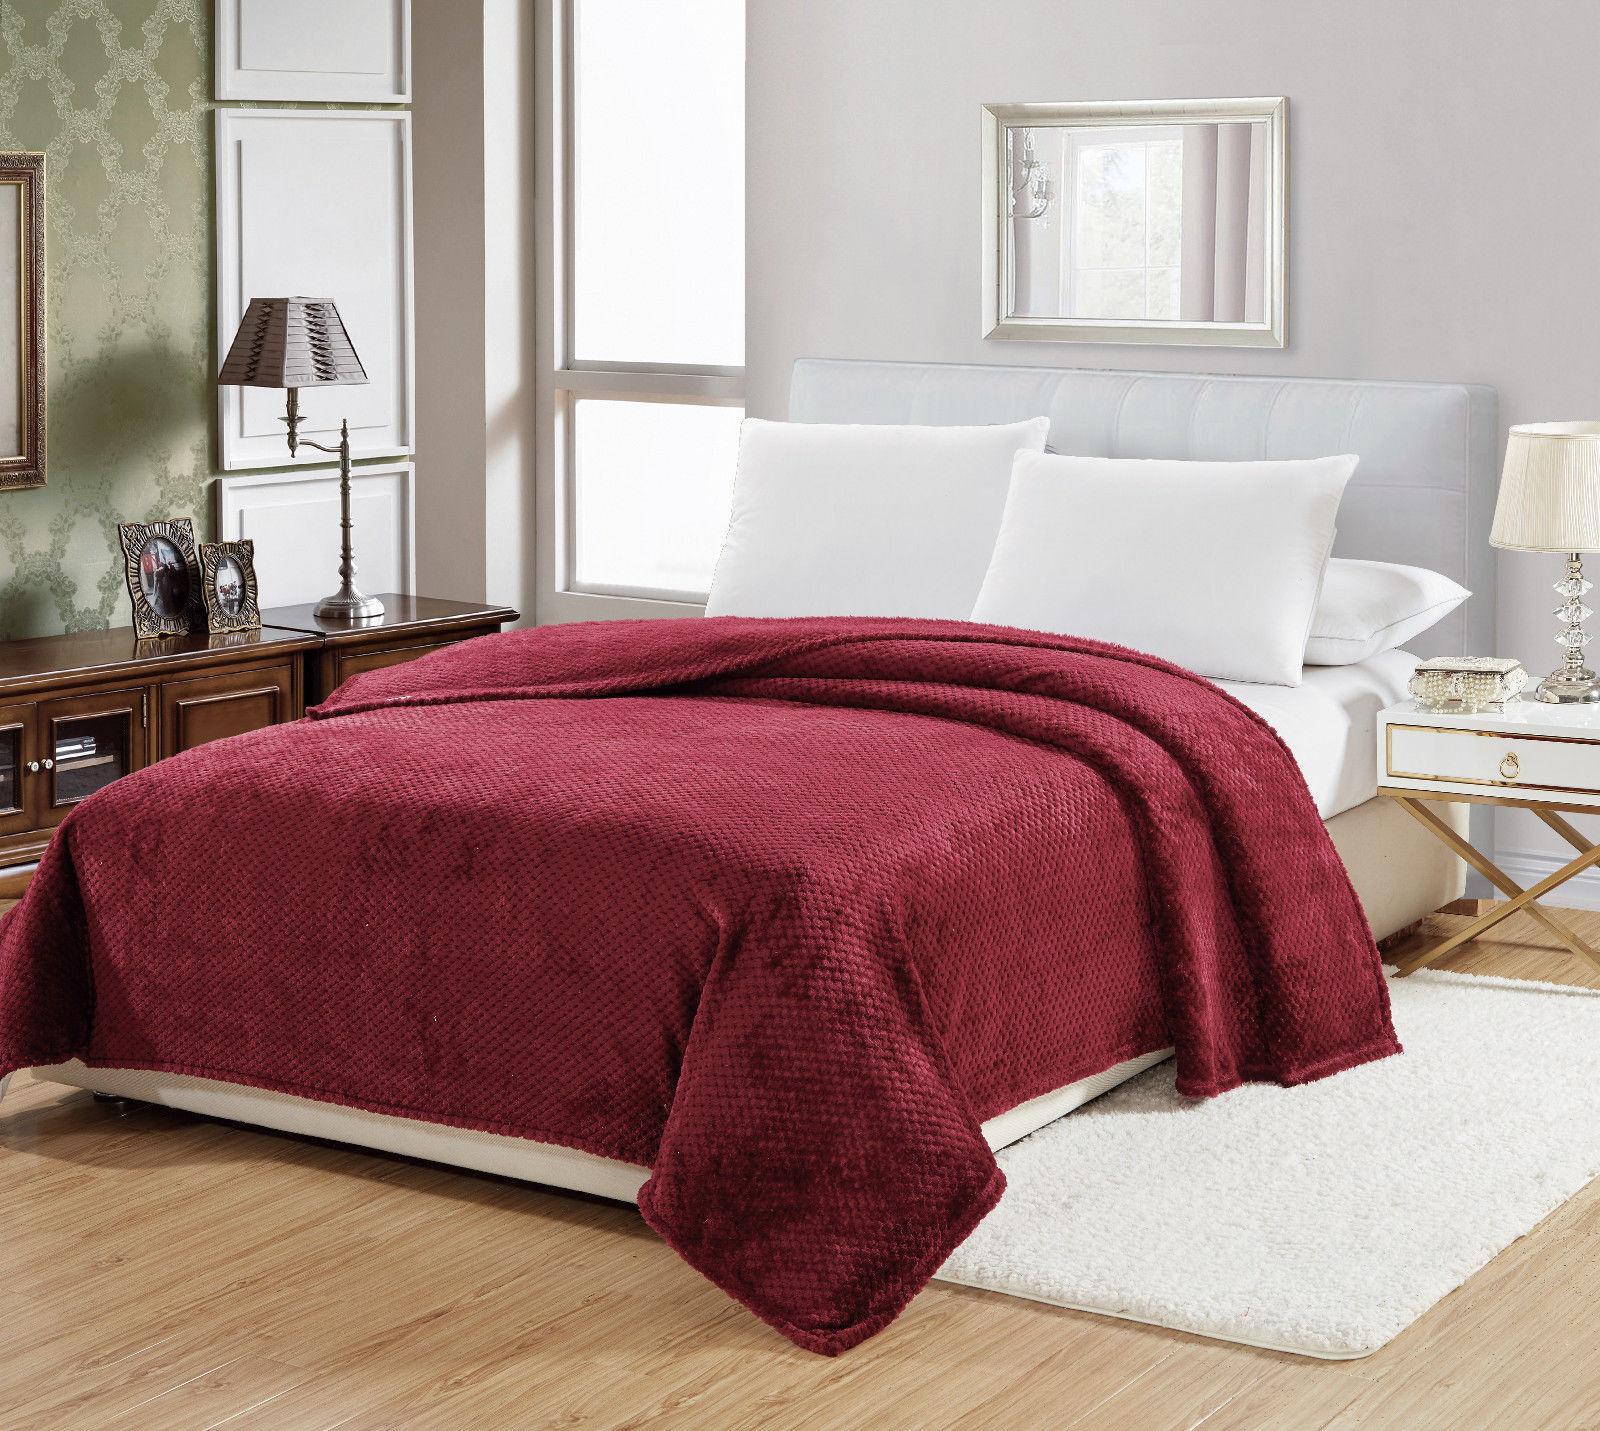 Premium Plush Throw Blanket Cover Assorted & Styles